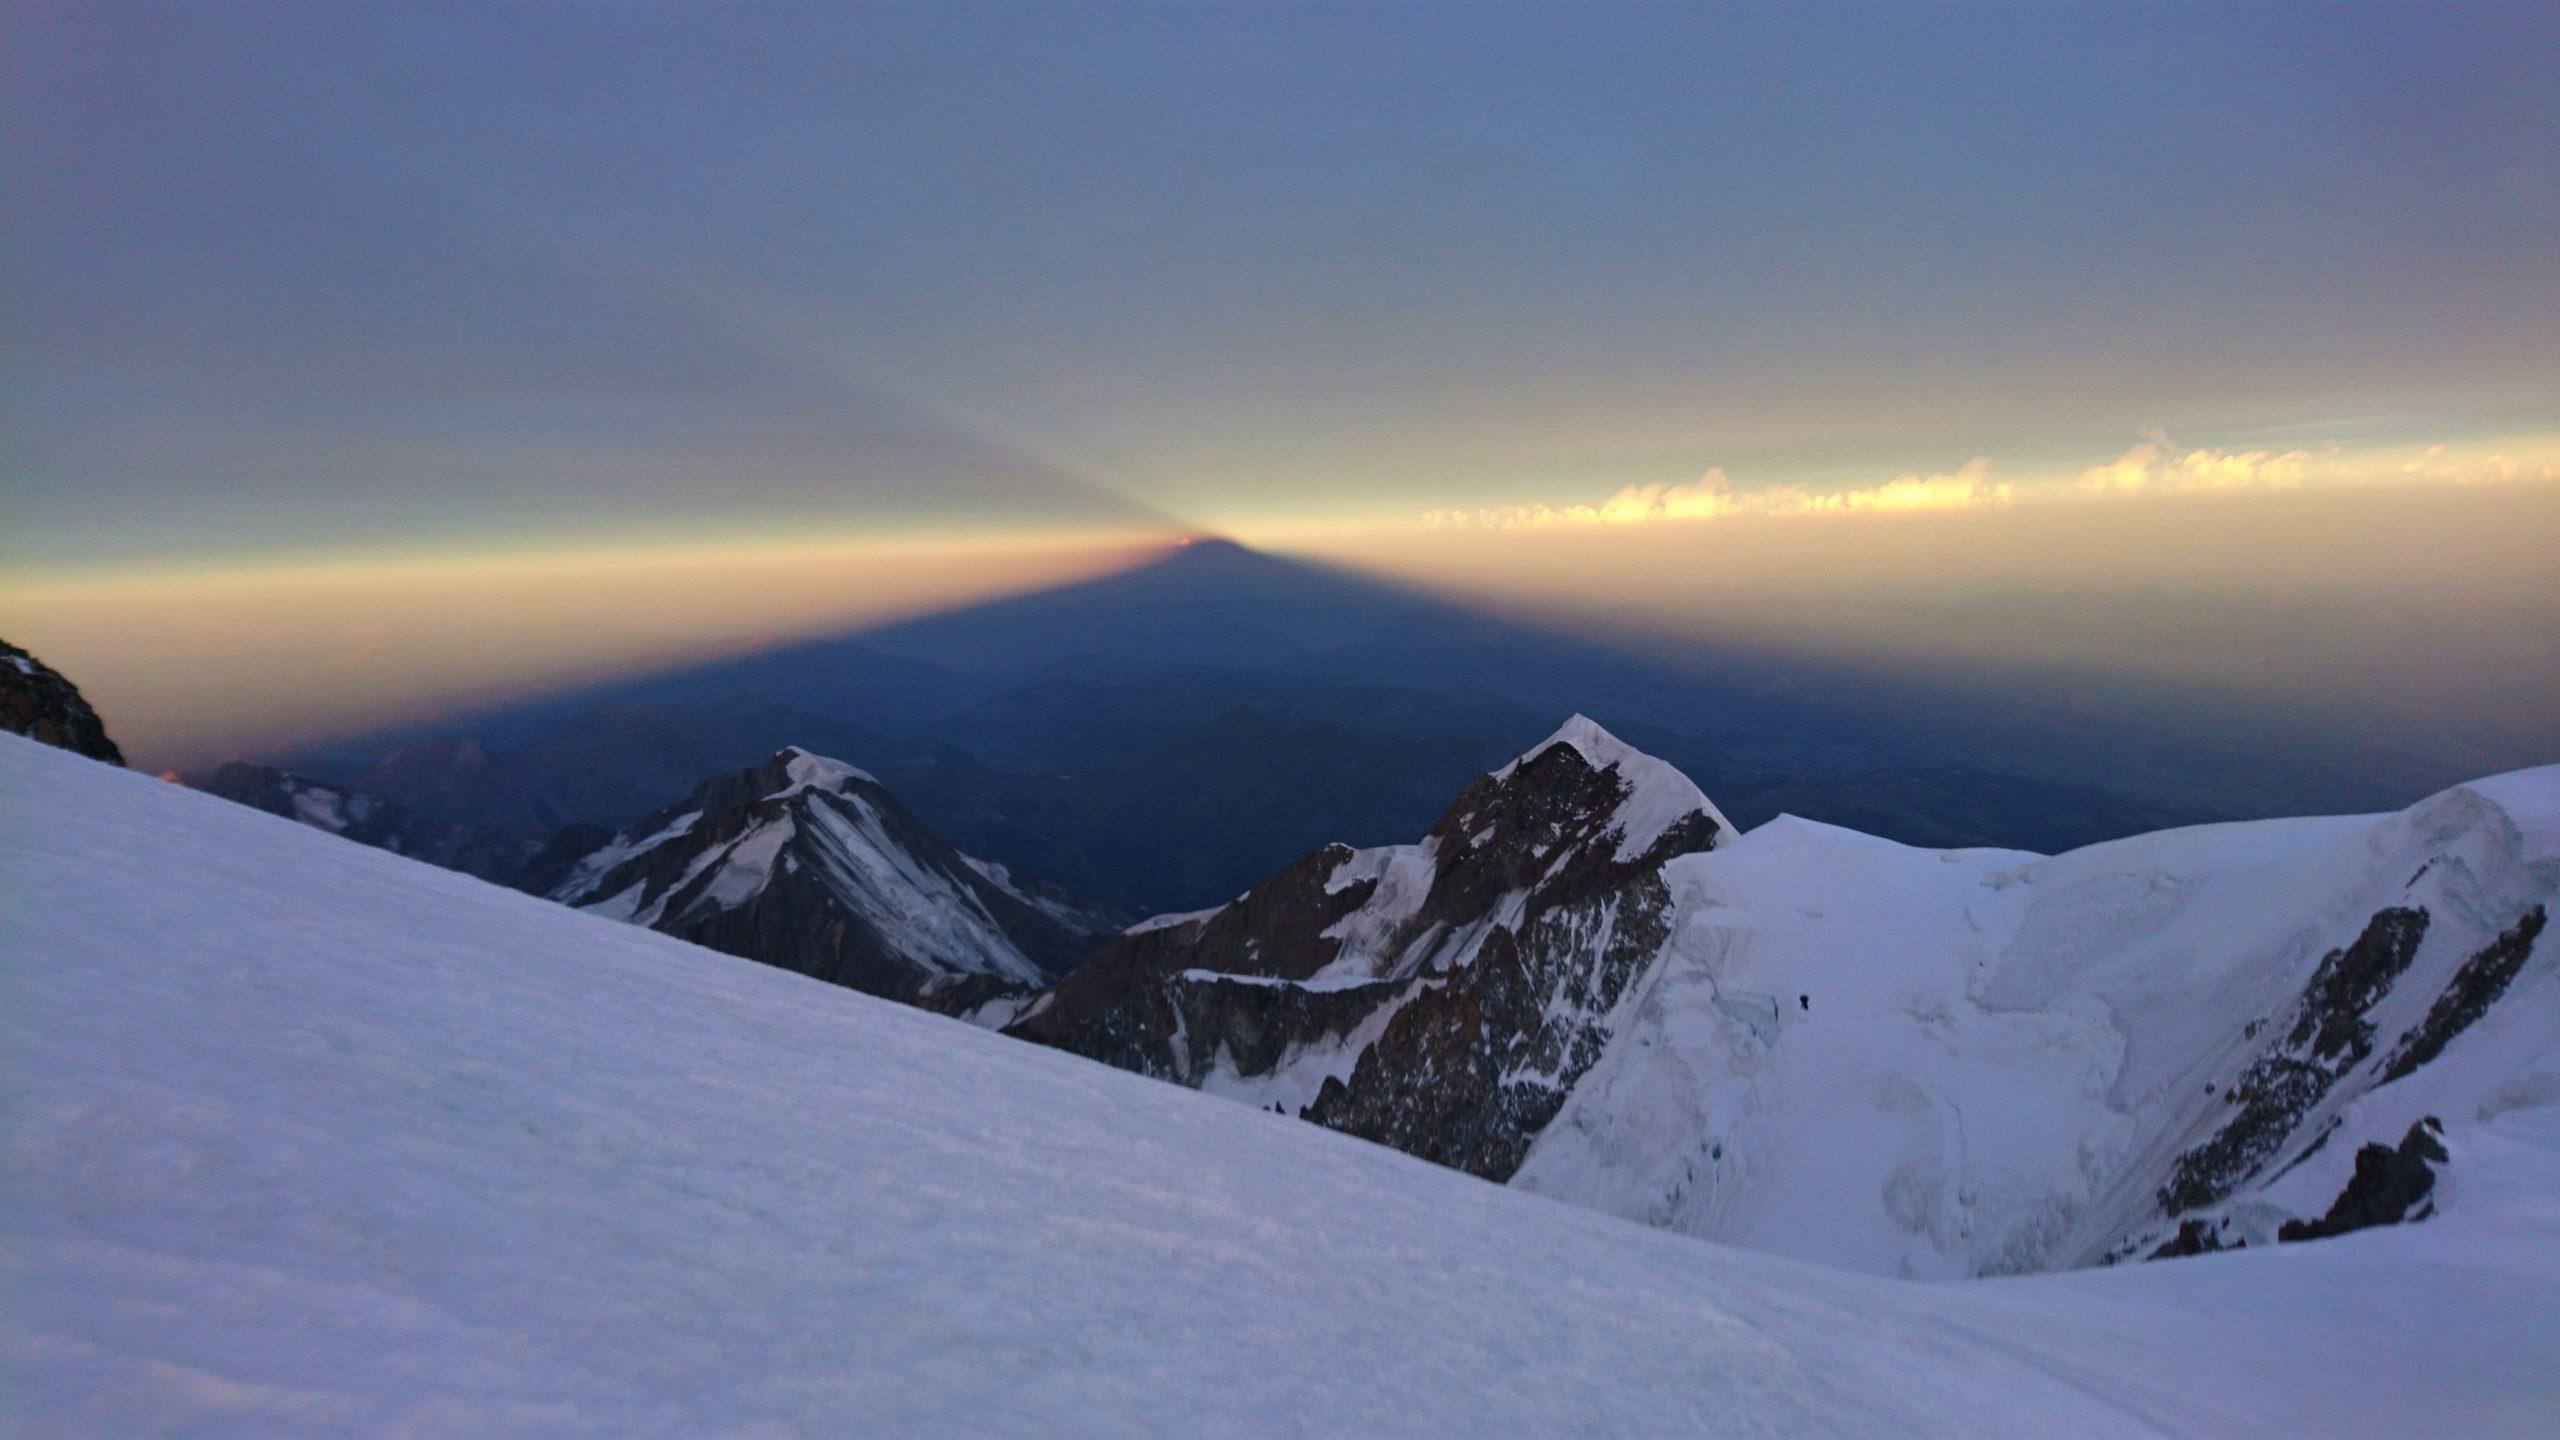 The Mont Blanc shadow at dawn © Andrea Cararo